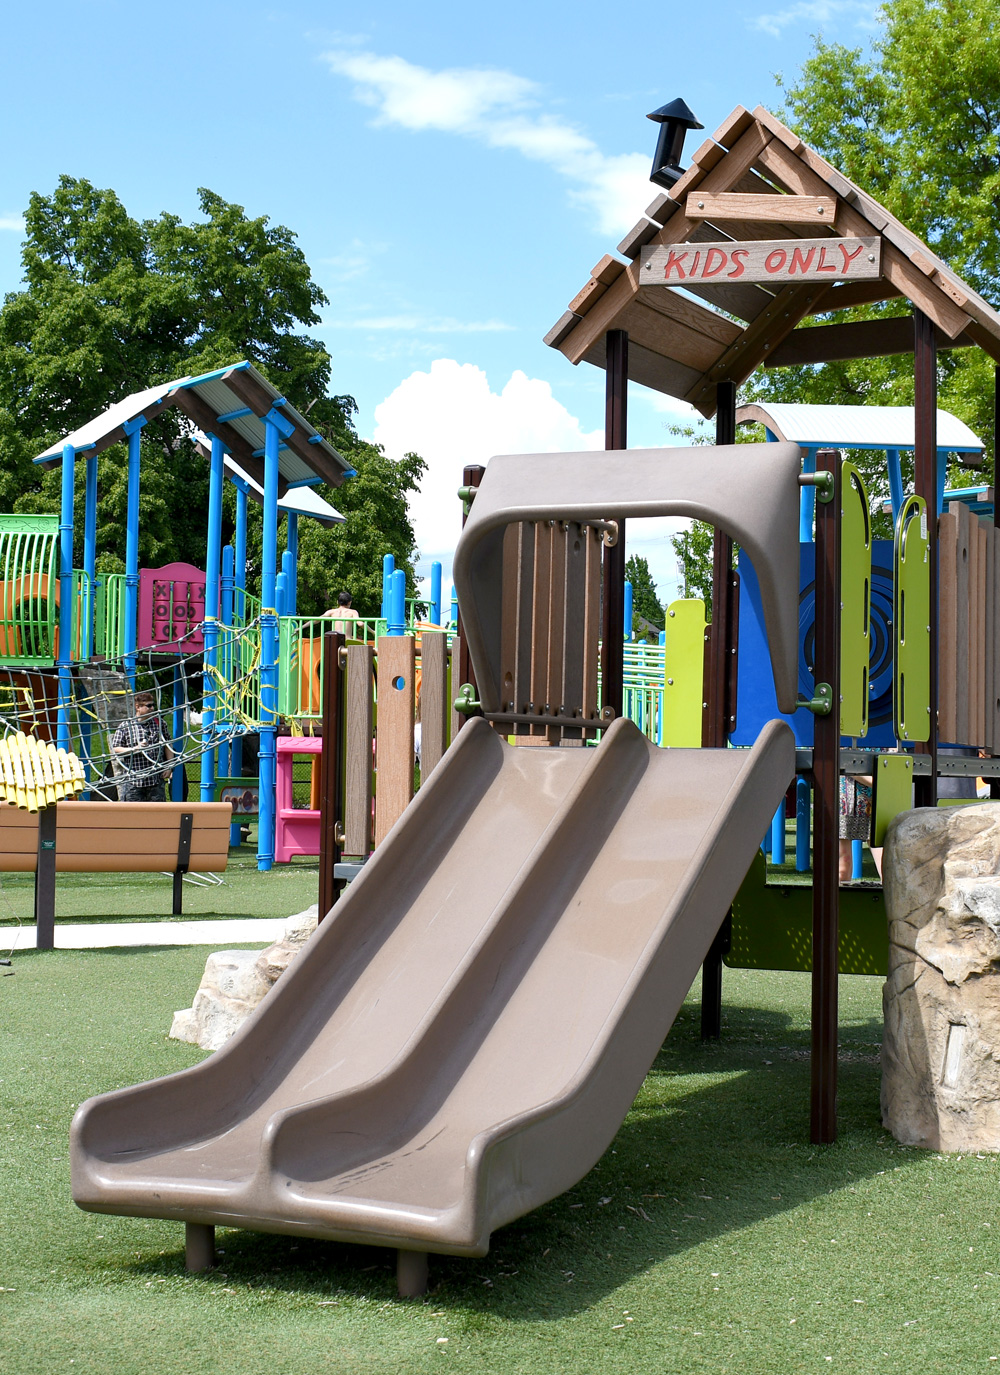 Best Playdate Parks in Coeur d'Alene